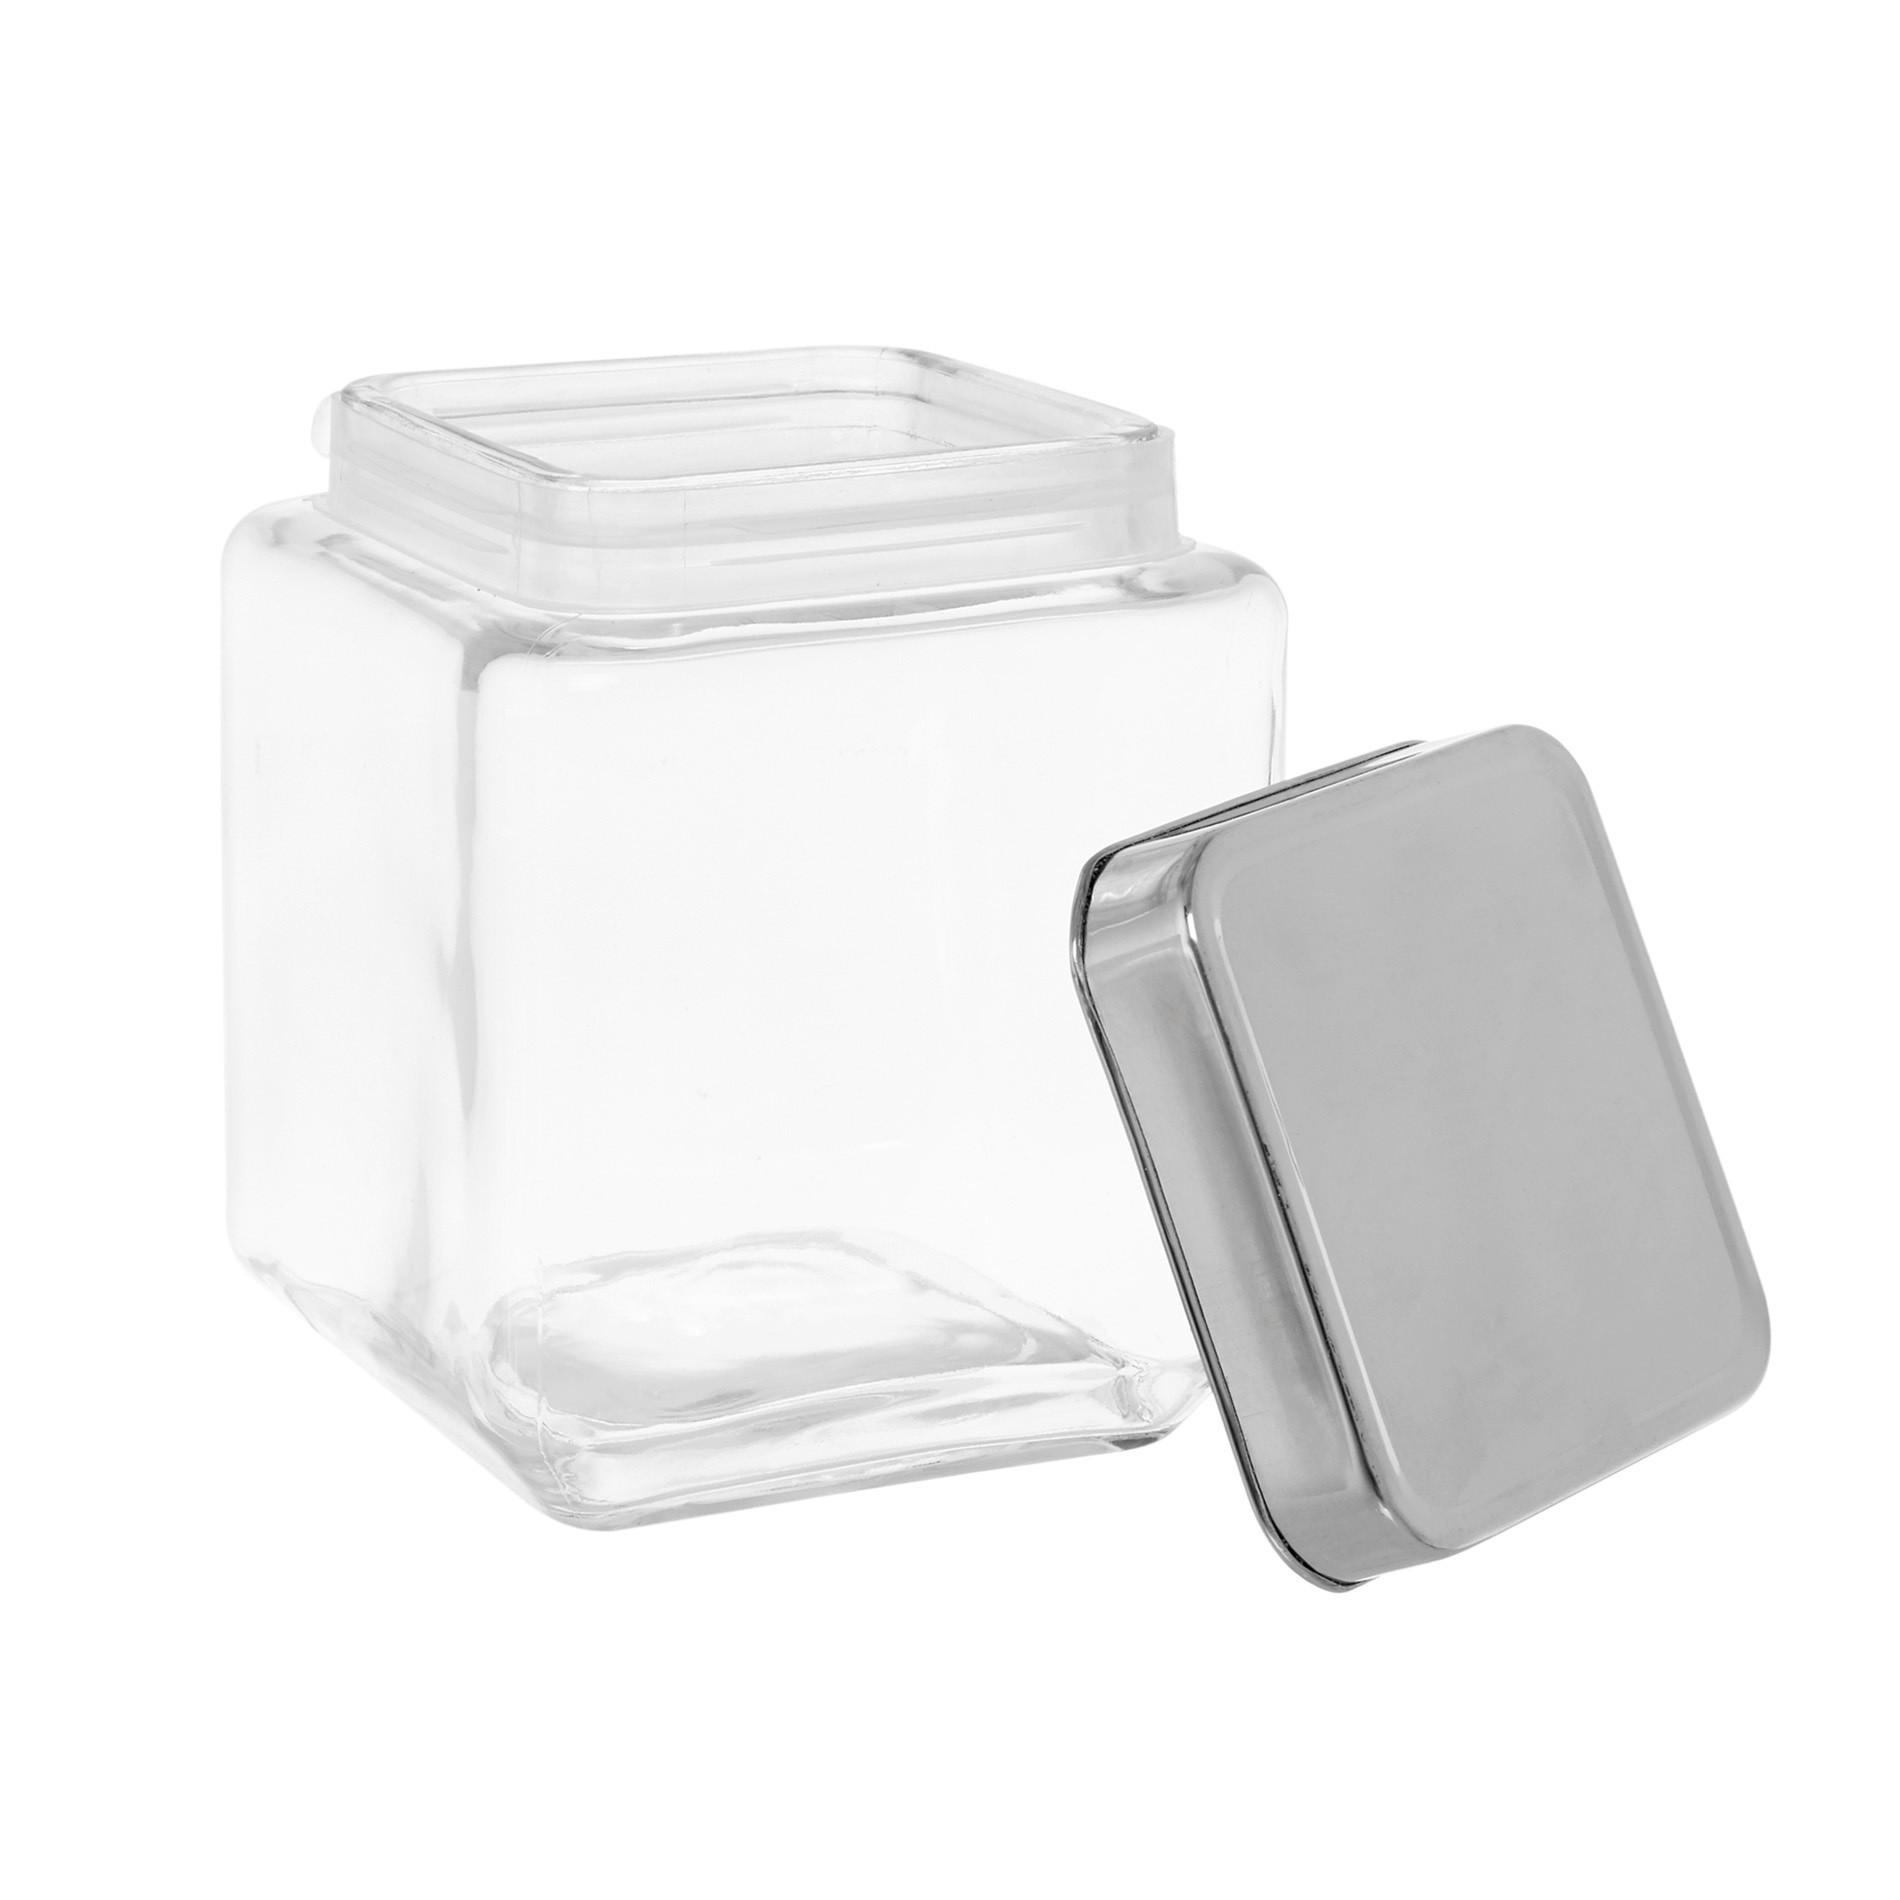 Barattolo vetro tappo inox 1.2Lt, Trasparente, large image number 1